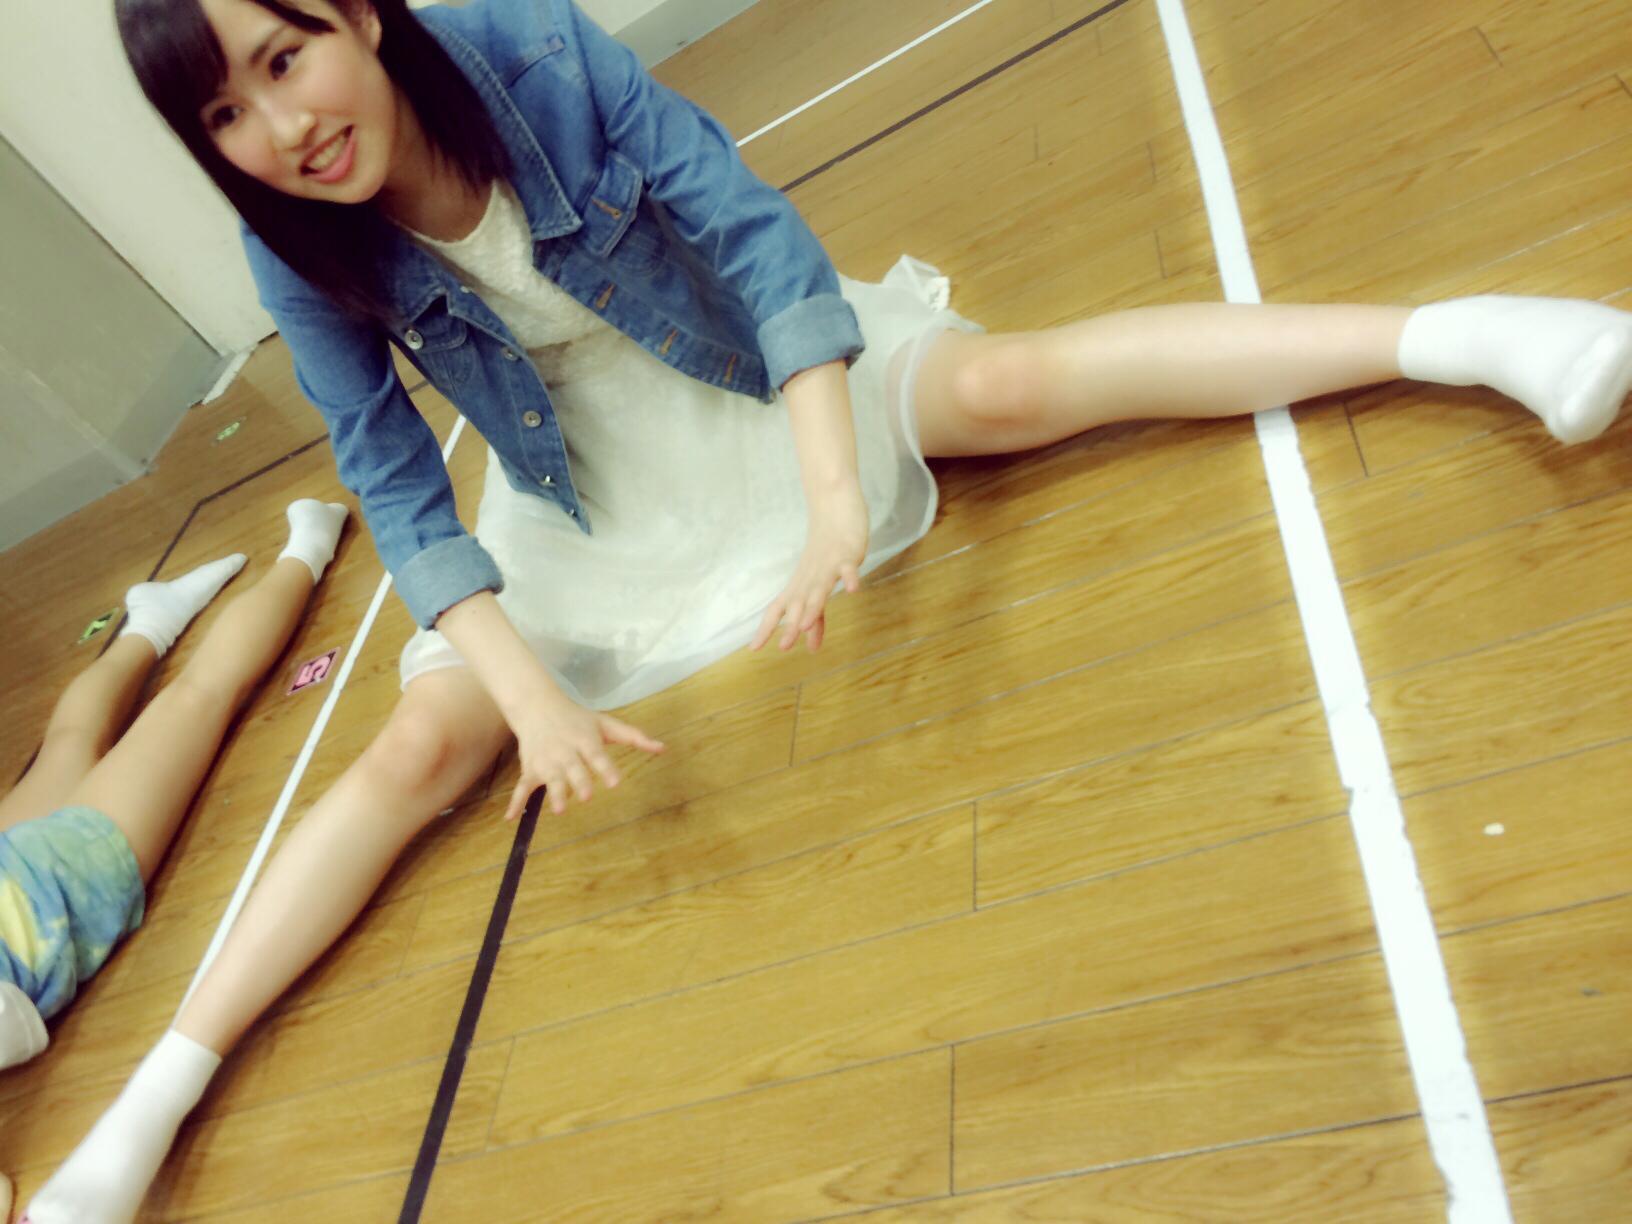 【NMB48】古賀成美応援スレ●32.1【なるなる】 YouTube動画>7本 ->画像>210枚